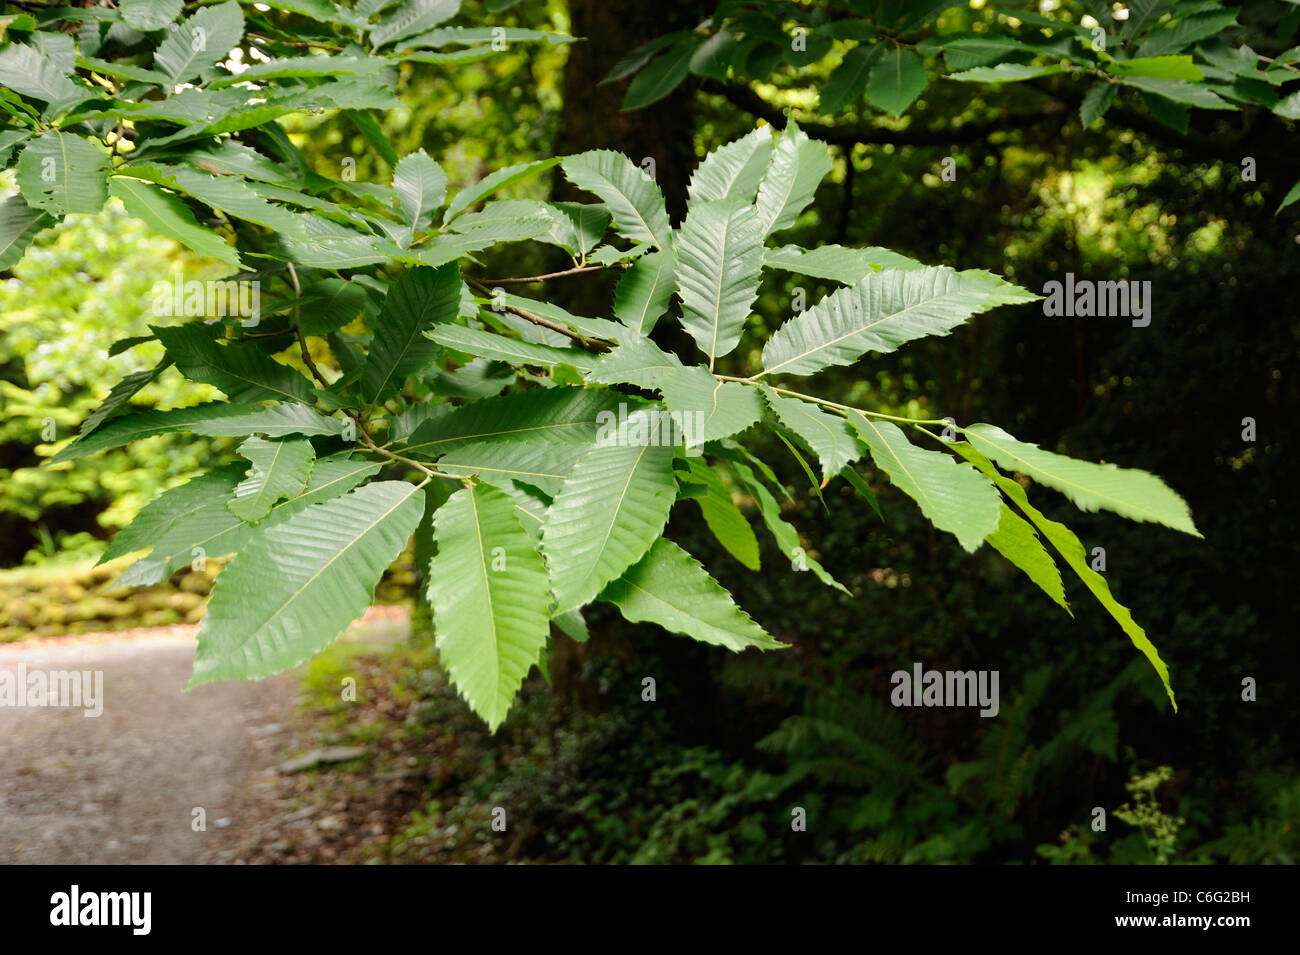 Sweet Chestnut leaves, castanea sativa Stock Photo